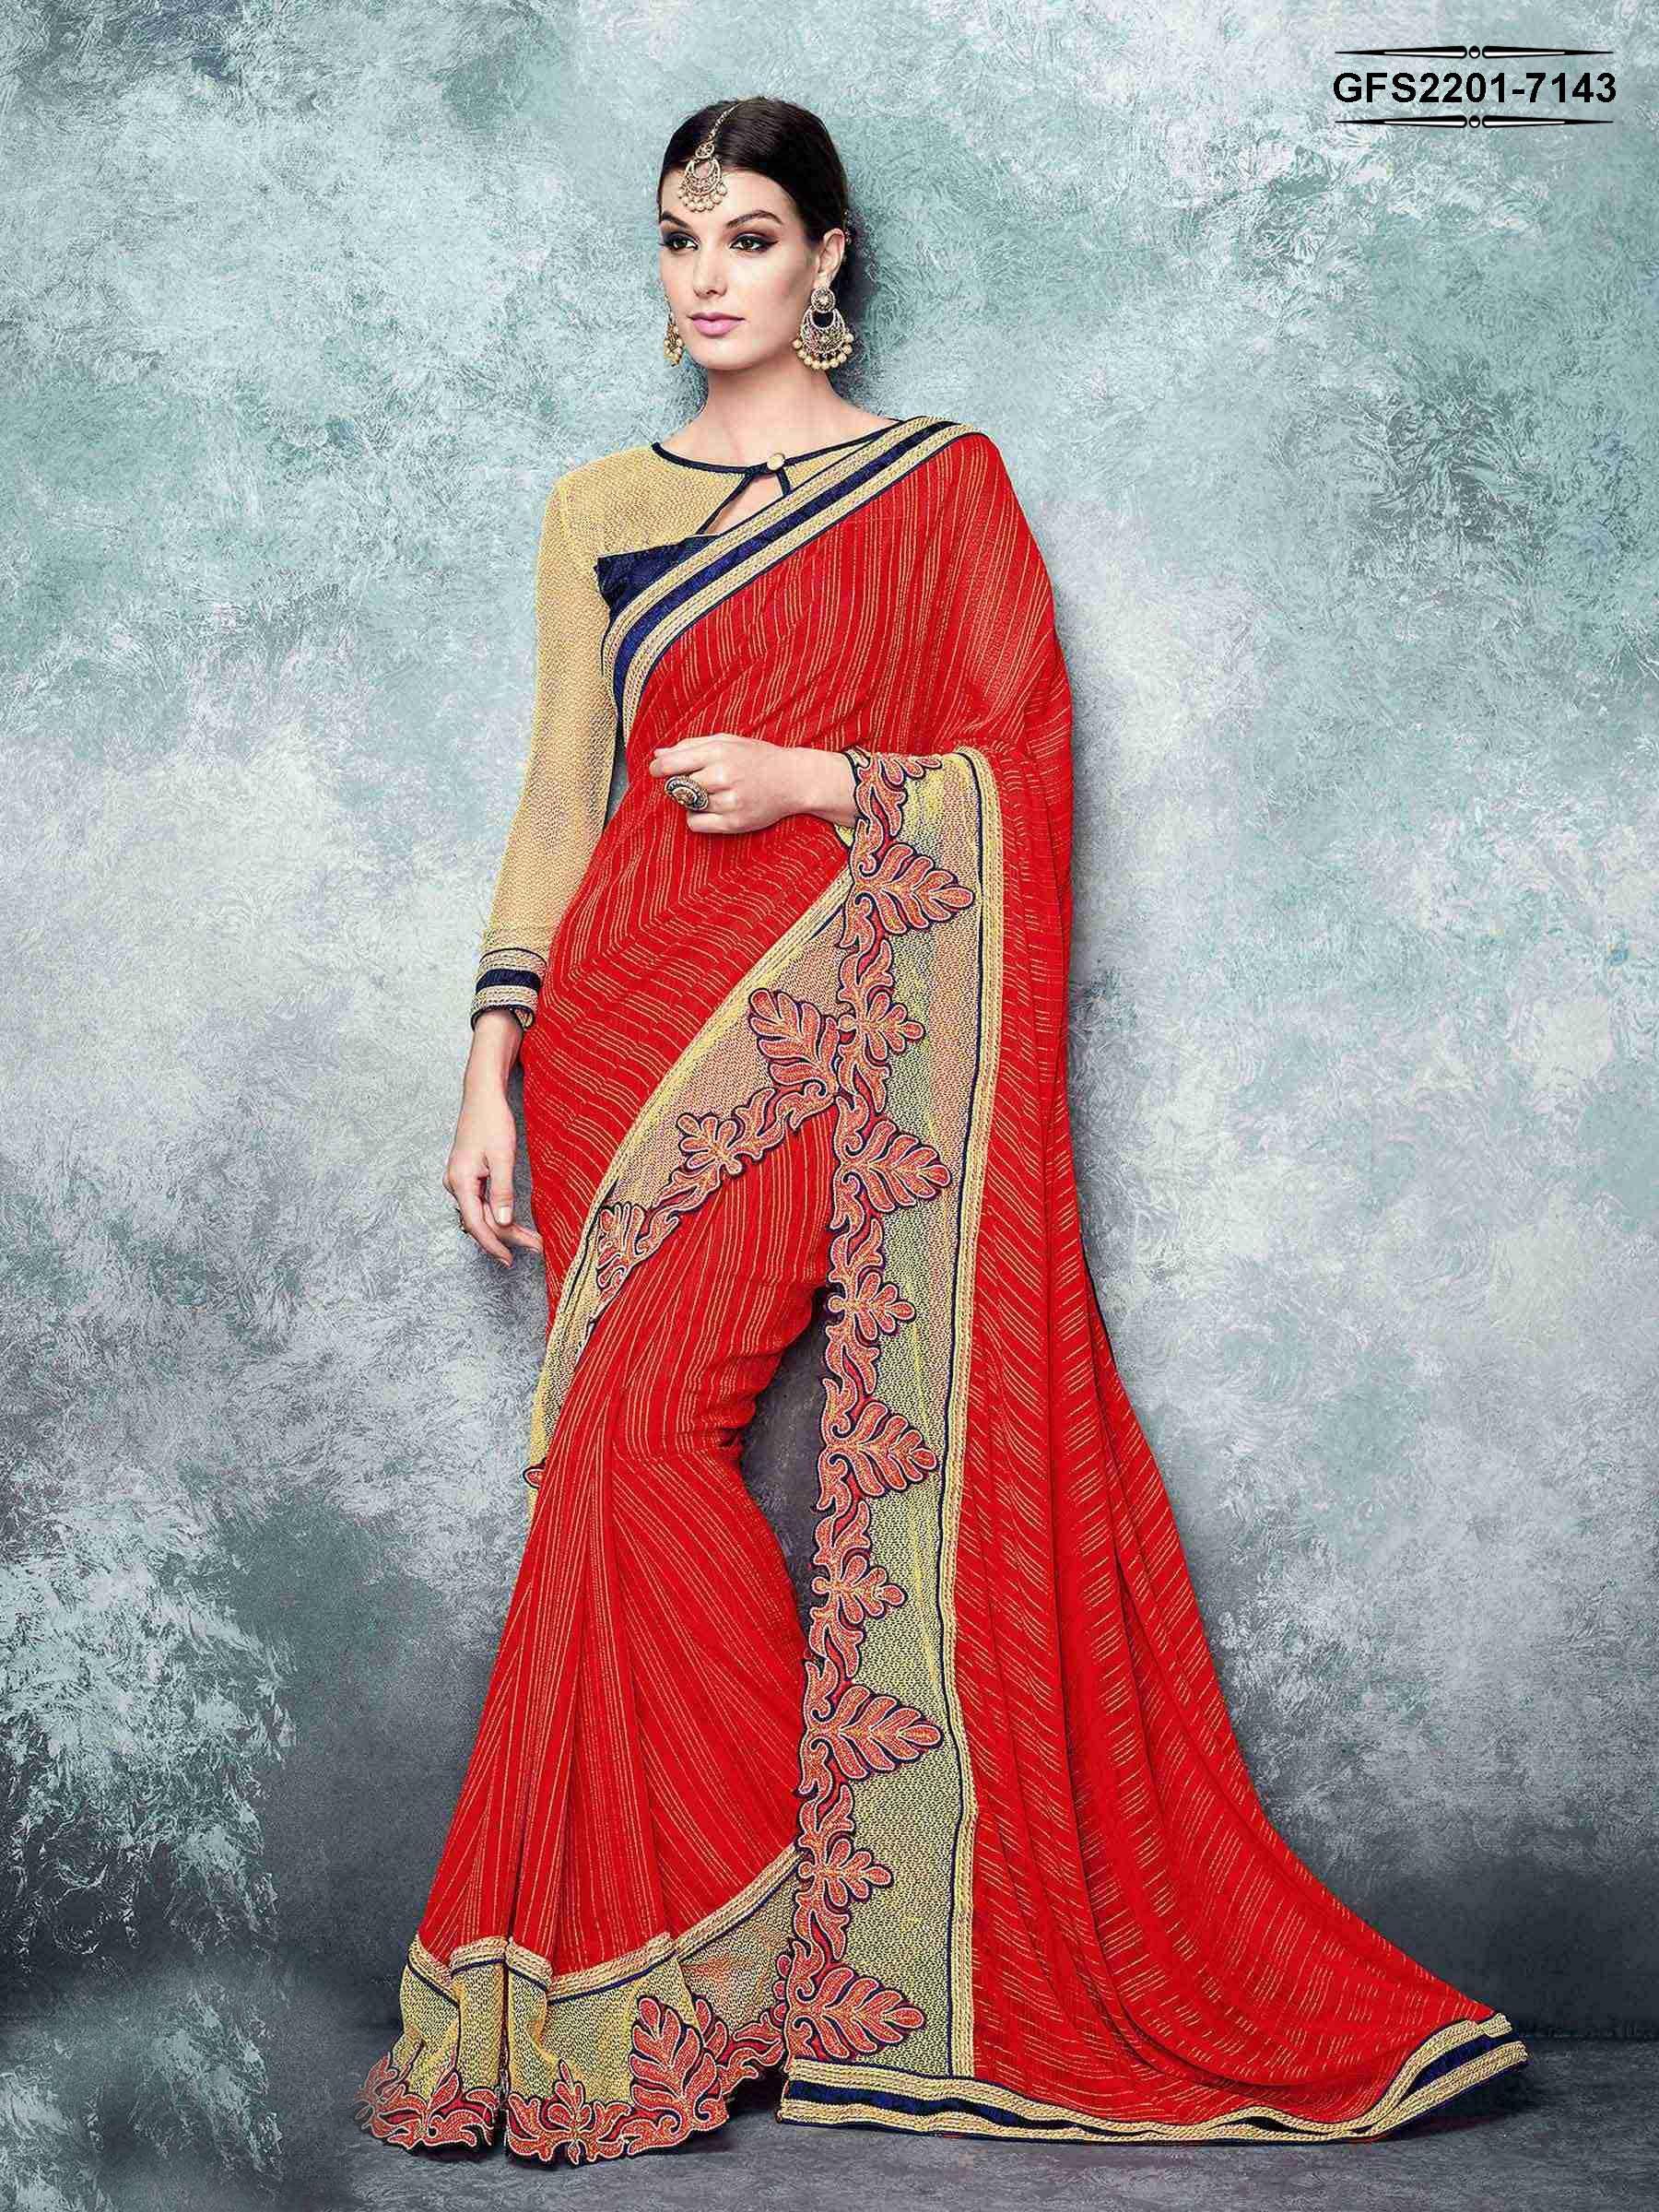 Saree blouse design for chiffon saree shop this saree gunjfashion   solitaire  charming